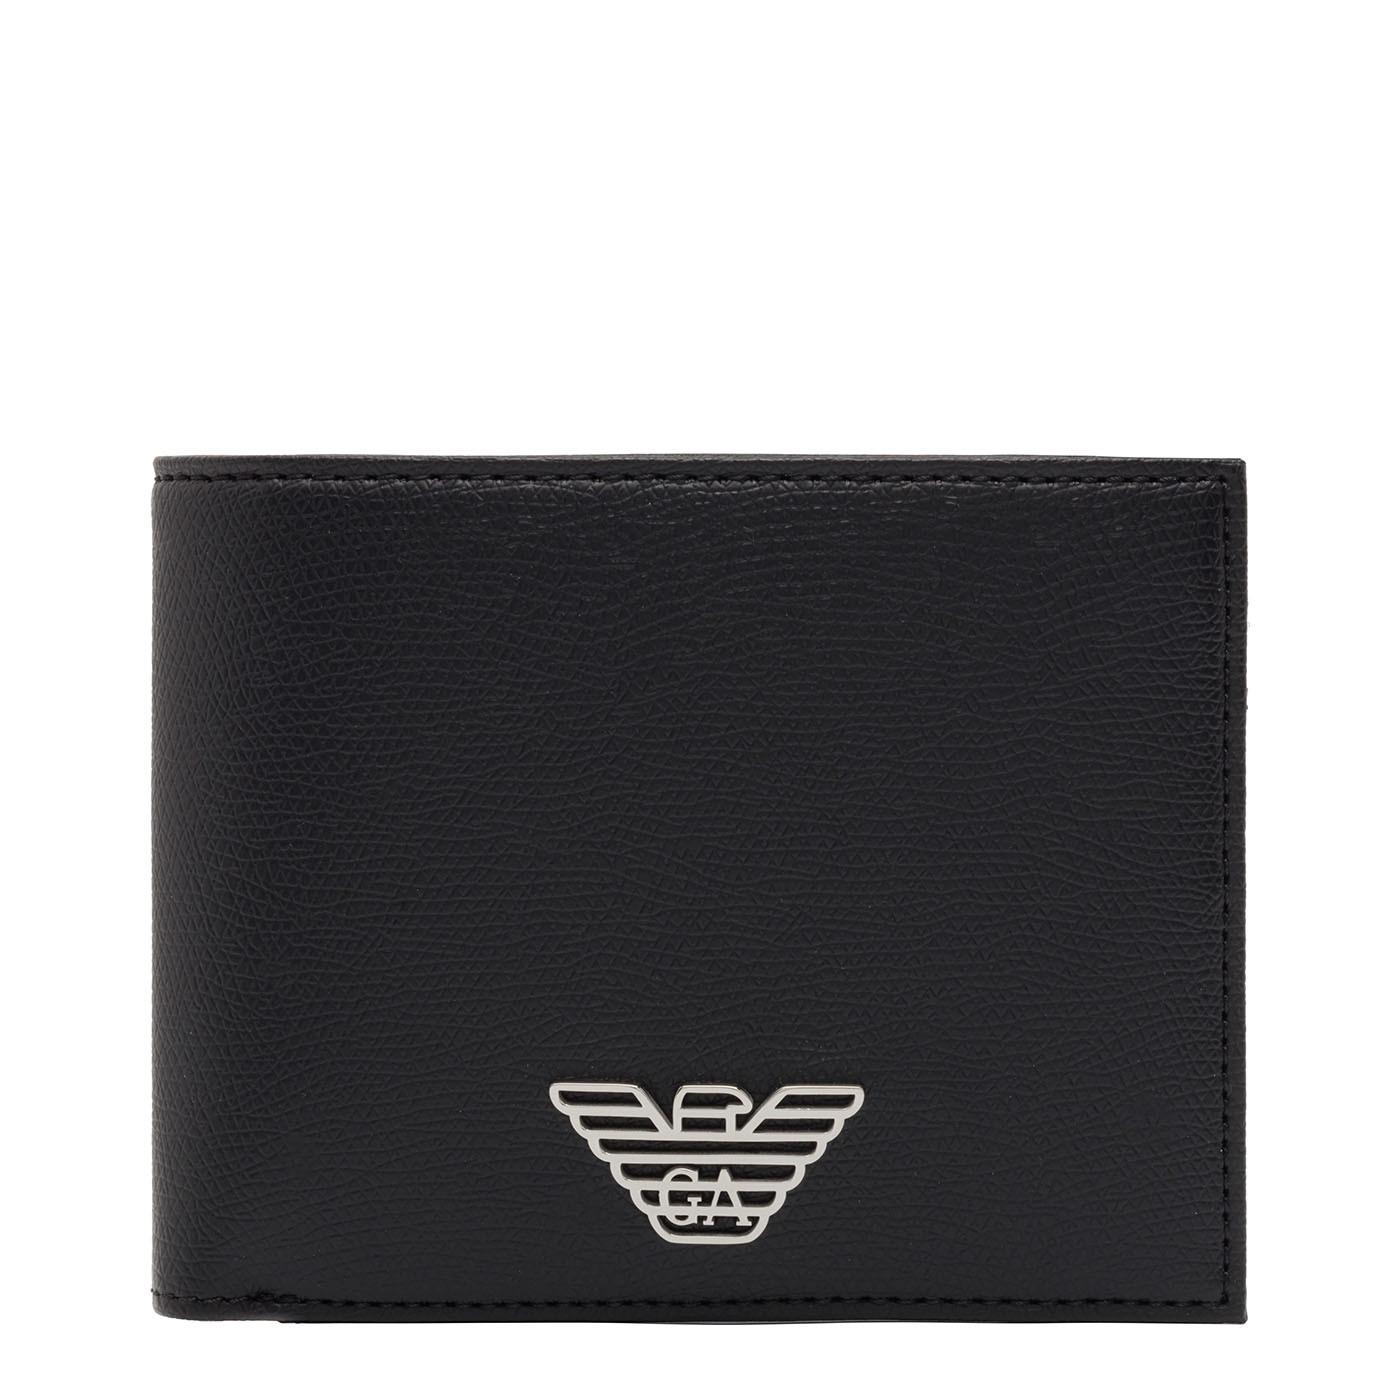 Emporio Armani Black Billfold Portemonnee Y4R165-YLA0E-81072